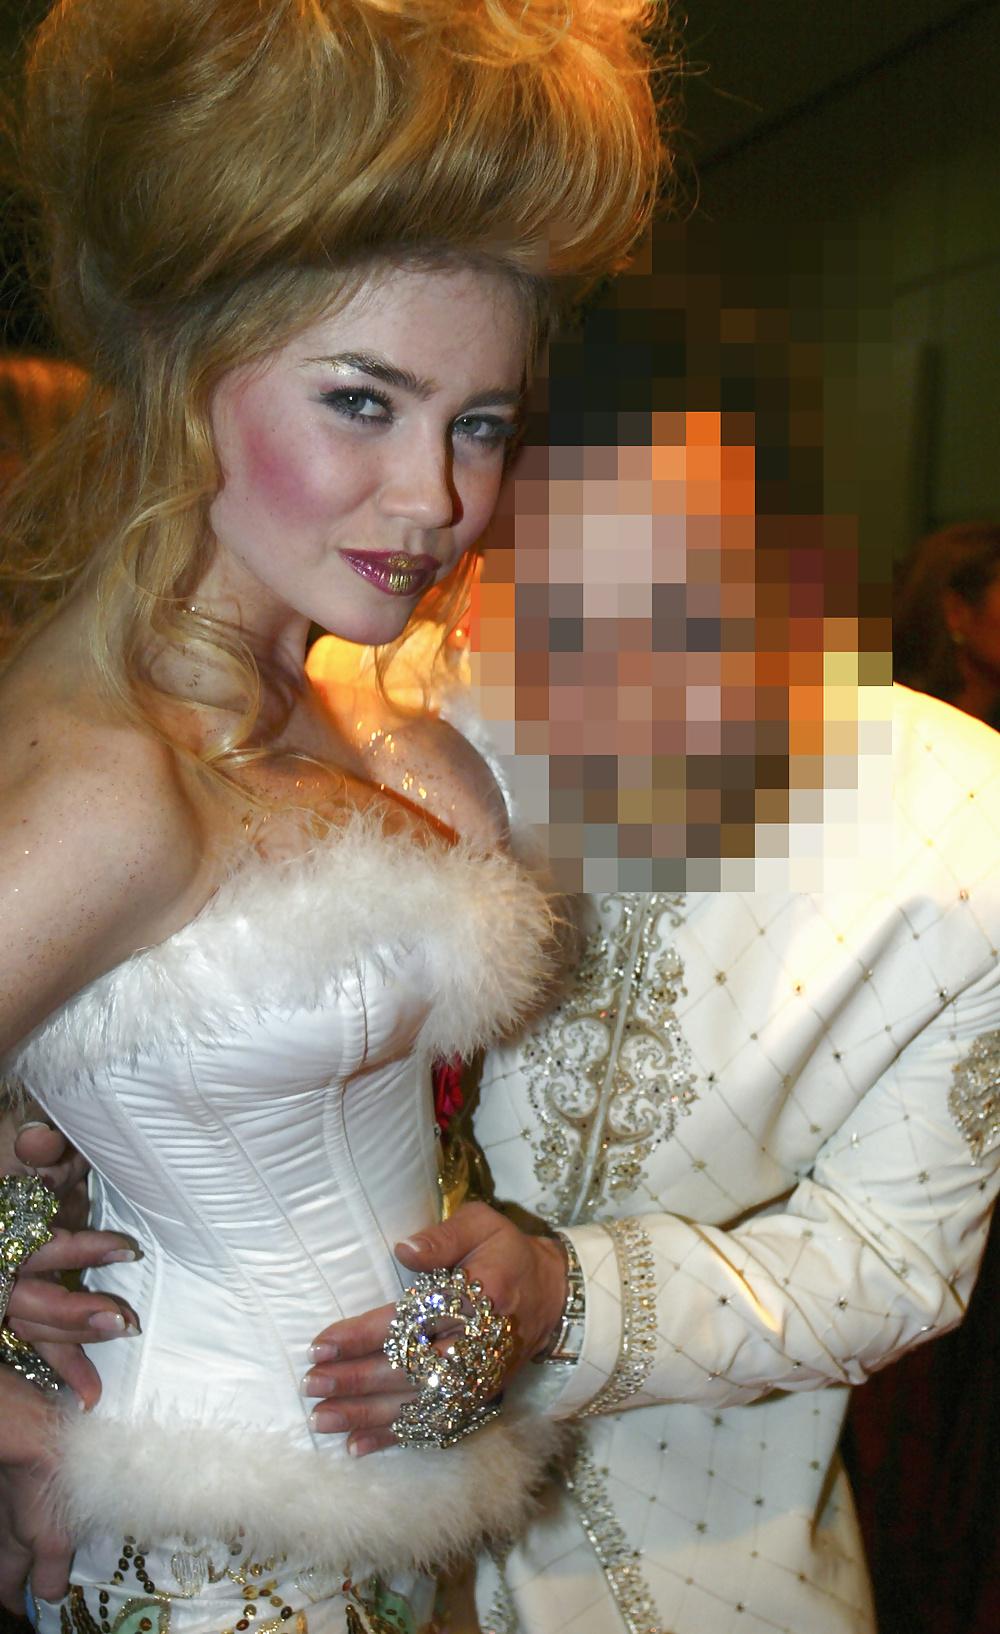 Russian escort berlin